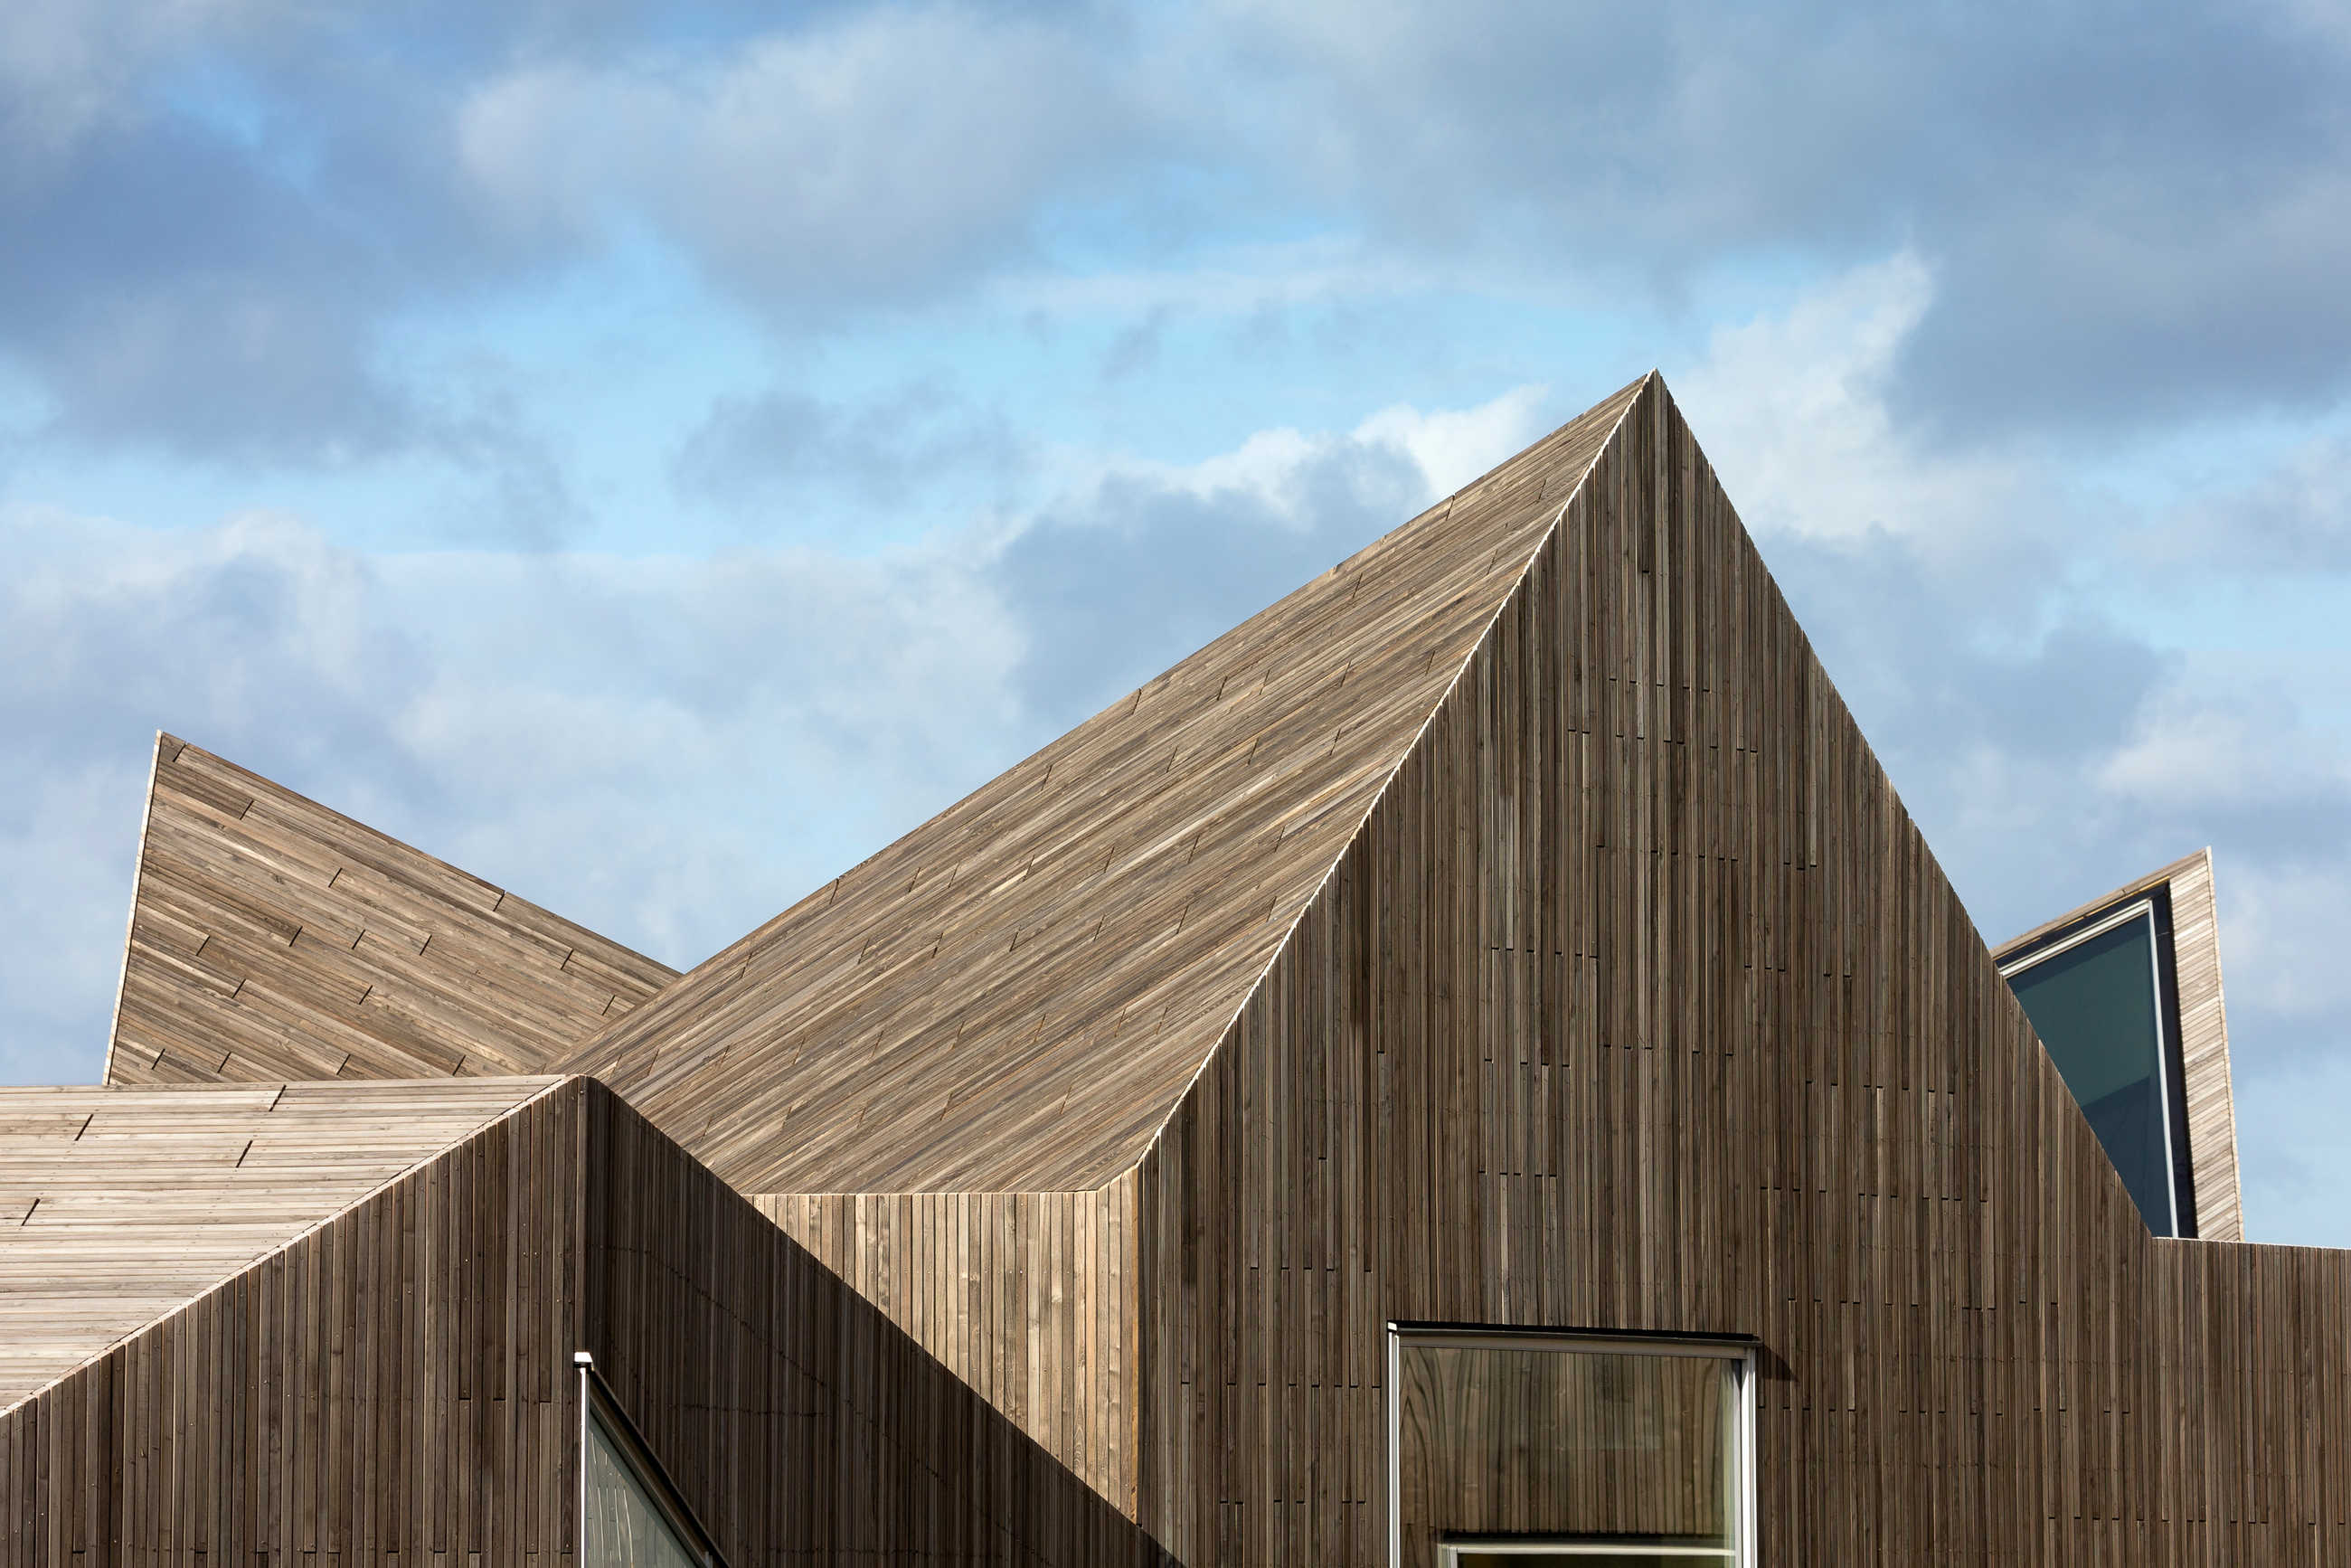 Råå Preschool designed by architect Dorte Mandrup